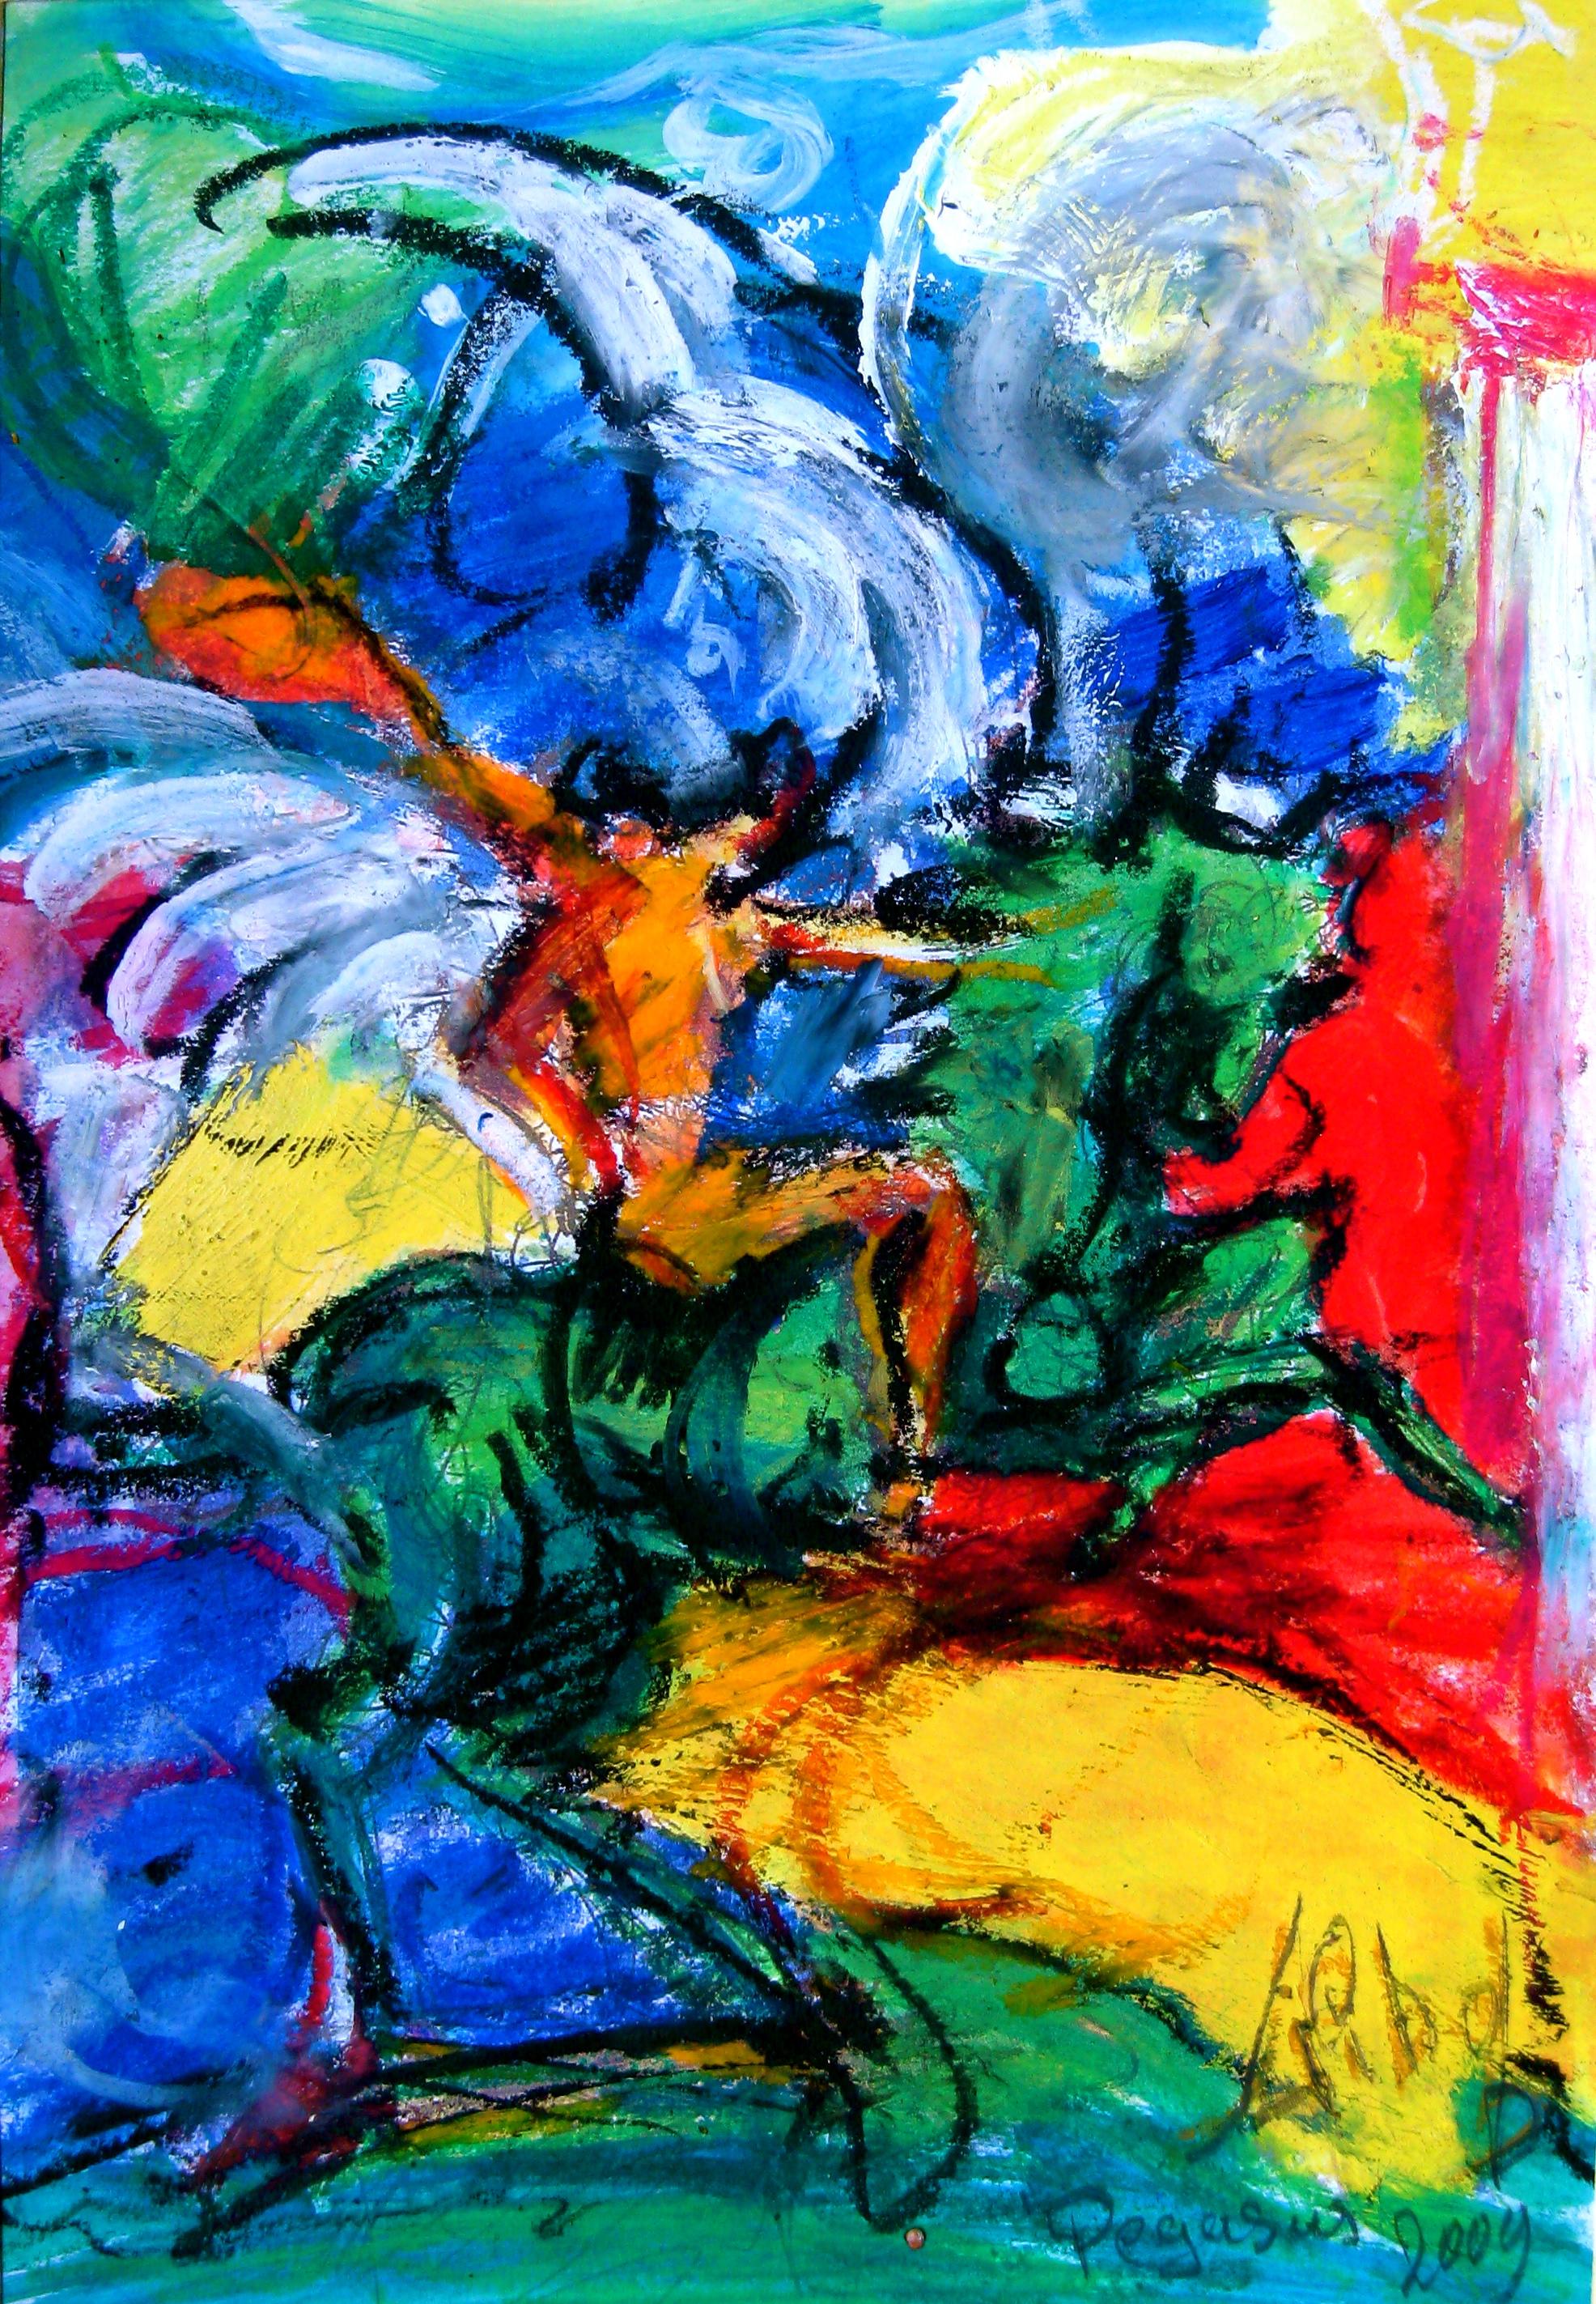 Pegasus Acrylverf op linnen 80 x 100 cm